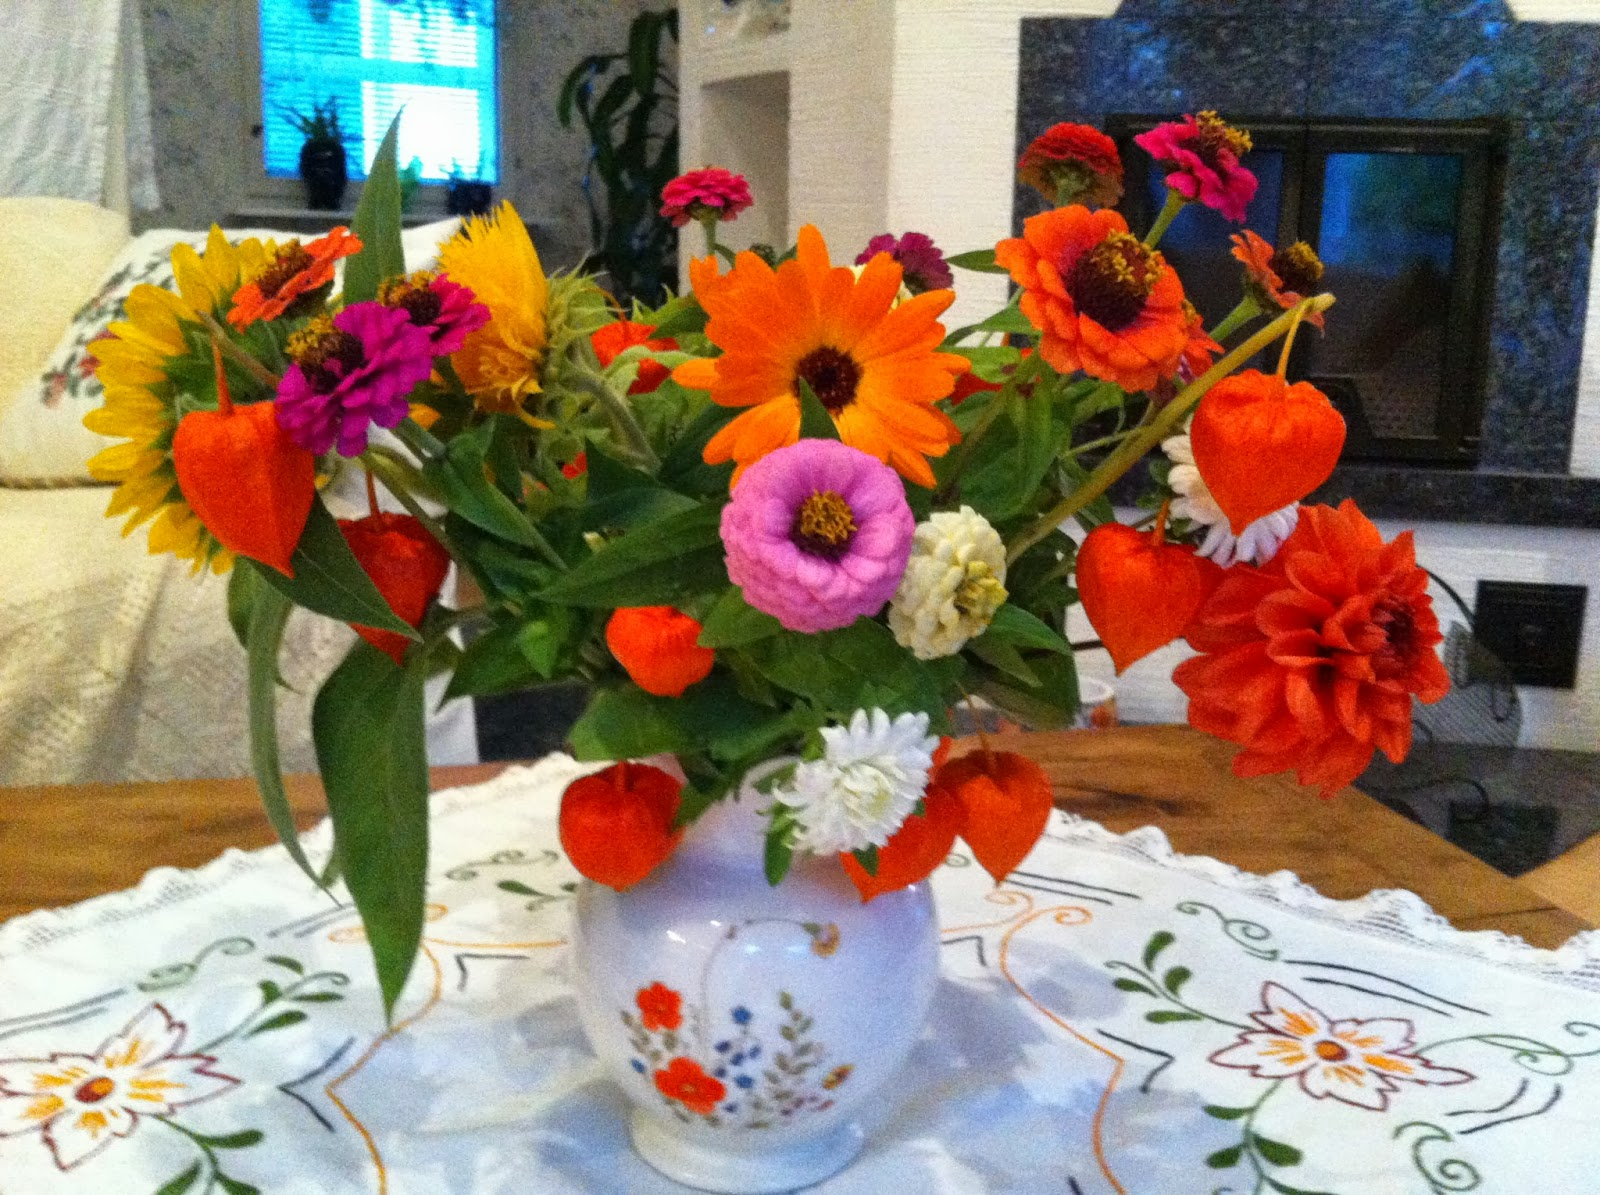 Viikonloppukimppu – Flowers for the weekend